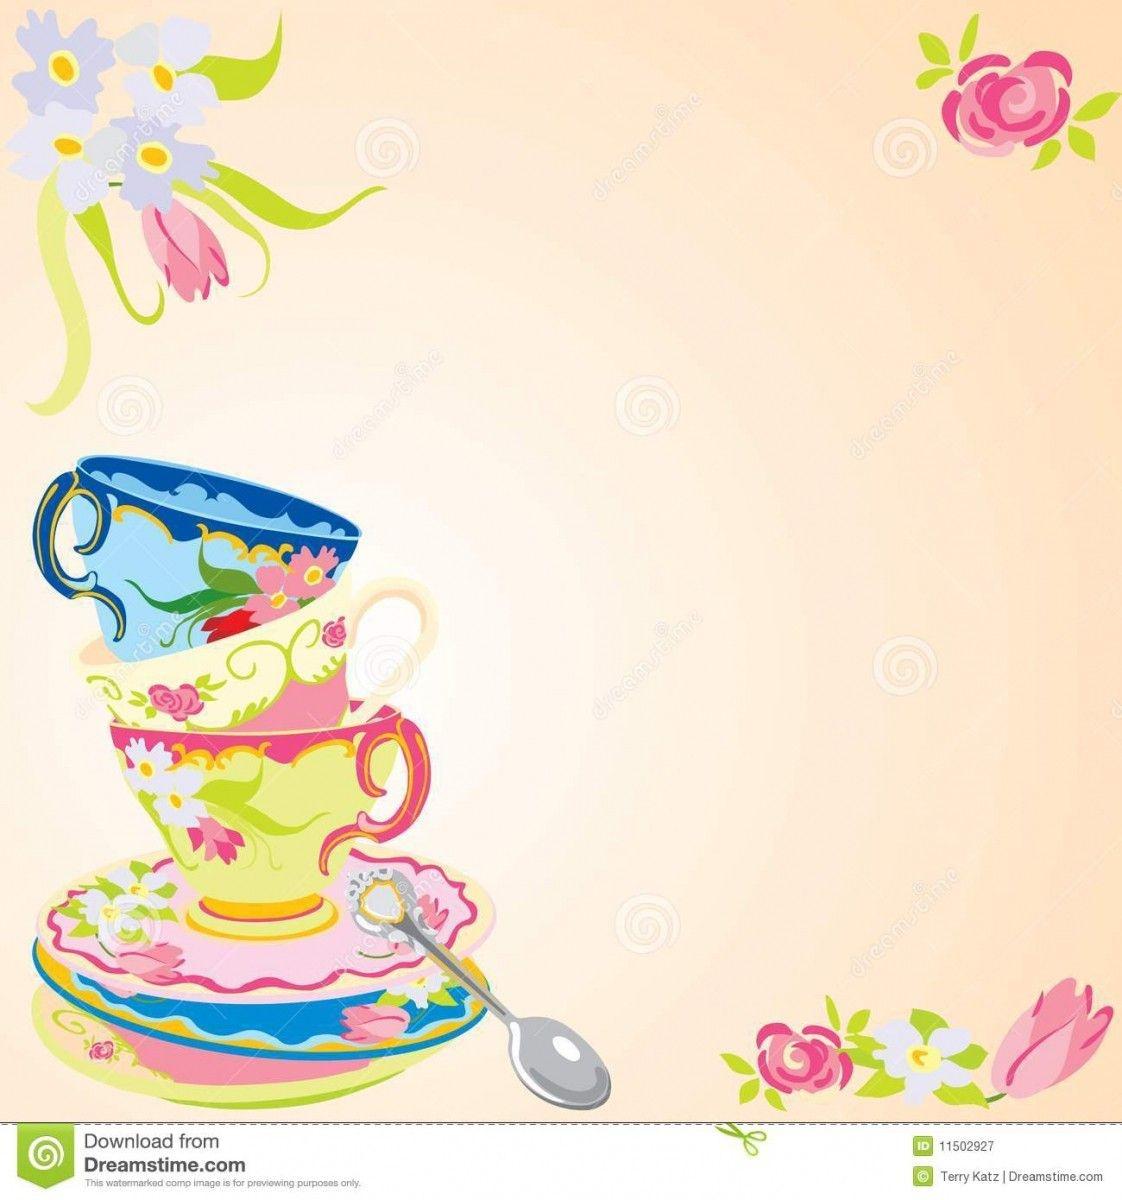 Free Printable High Tea Party Invitations | Work In 2019 | Tea Party - Free Printable Kitchen Tea Invitation Templates